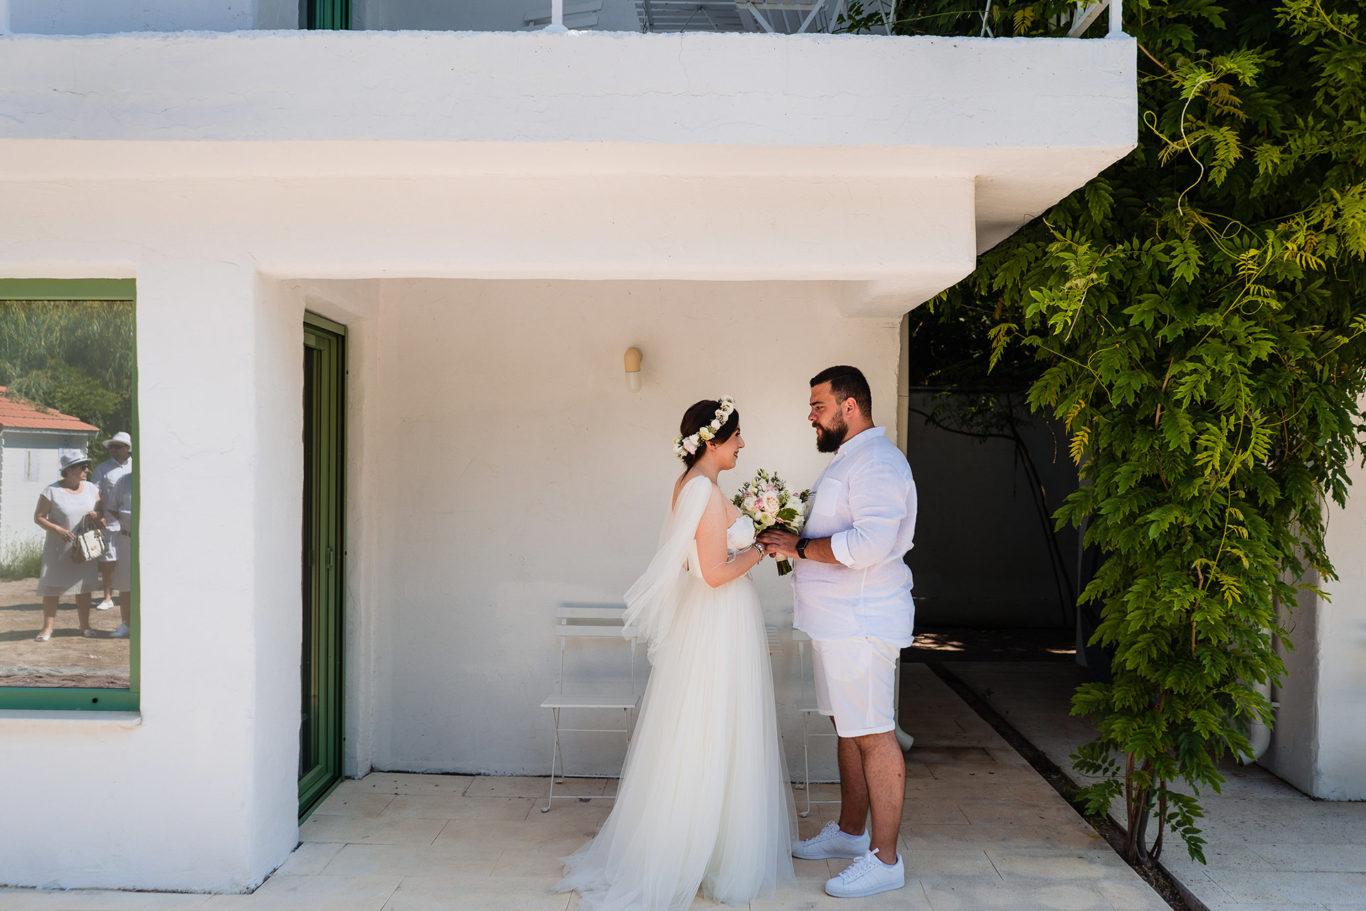 Nunta pe plaja @ Olimp   fotograf nunta Ciprian Dumitrescu